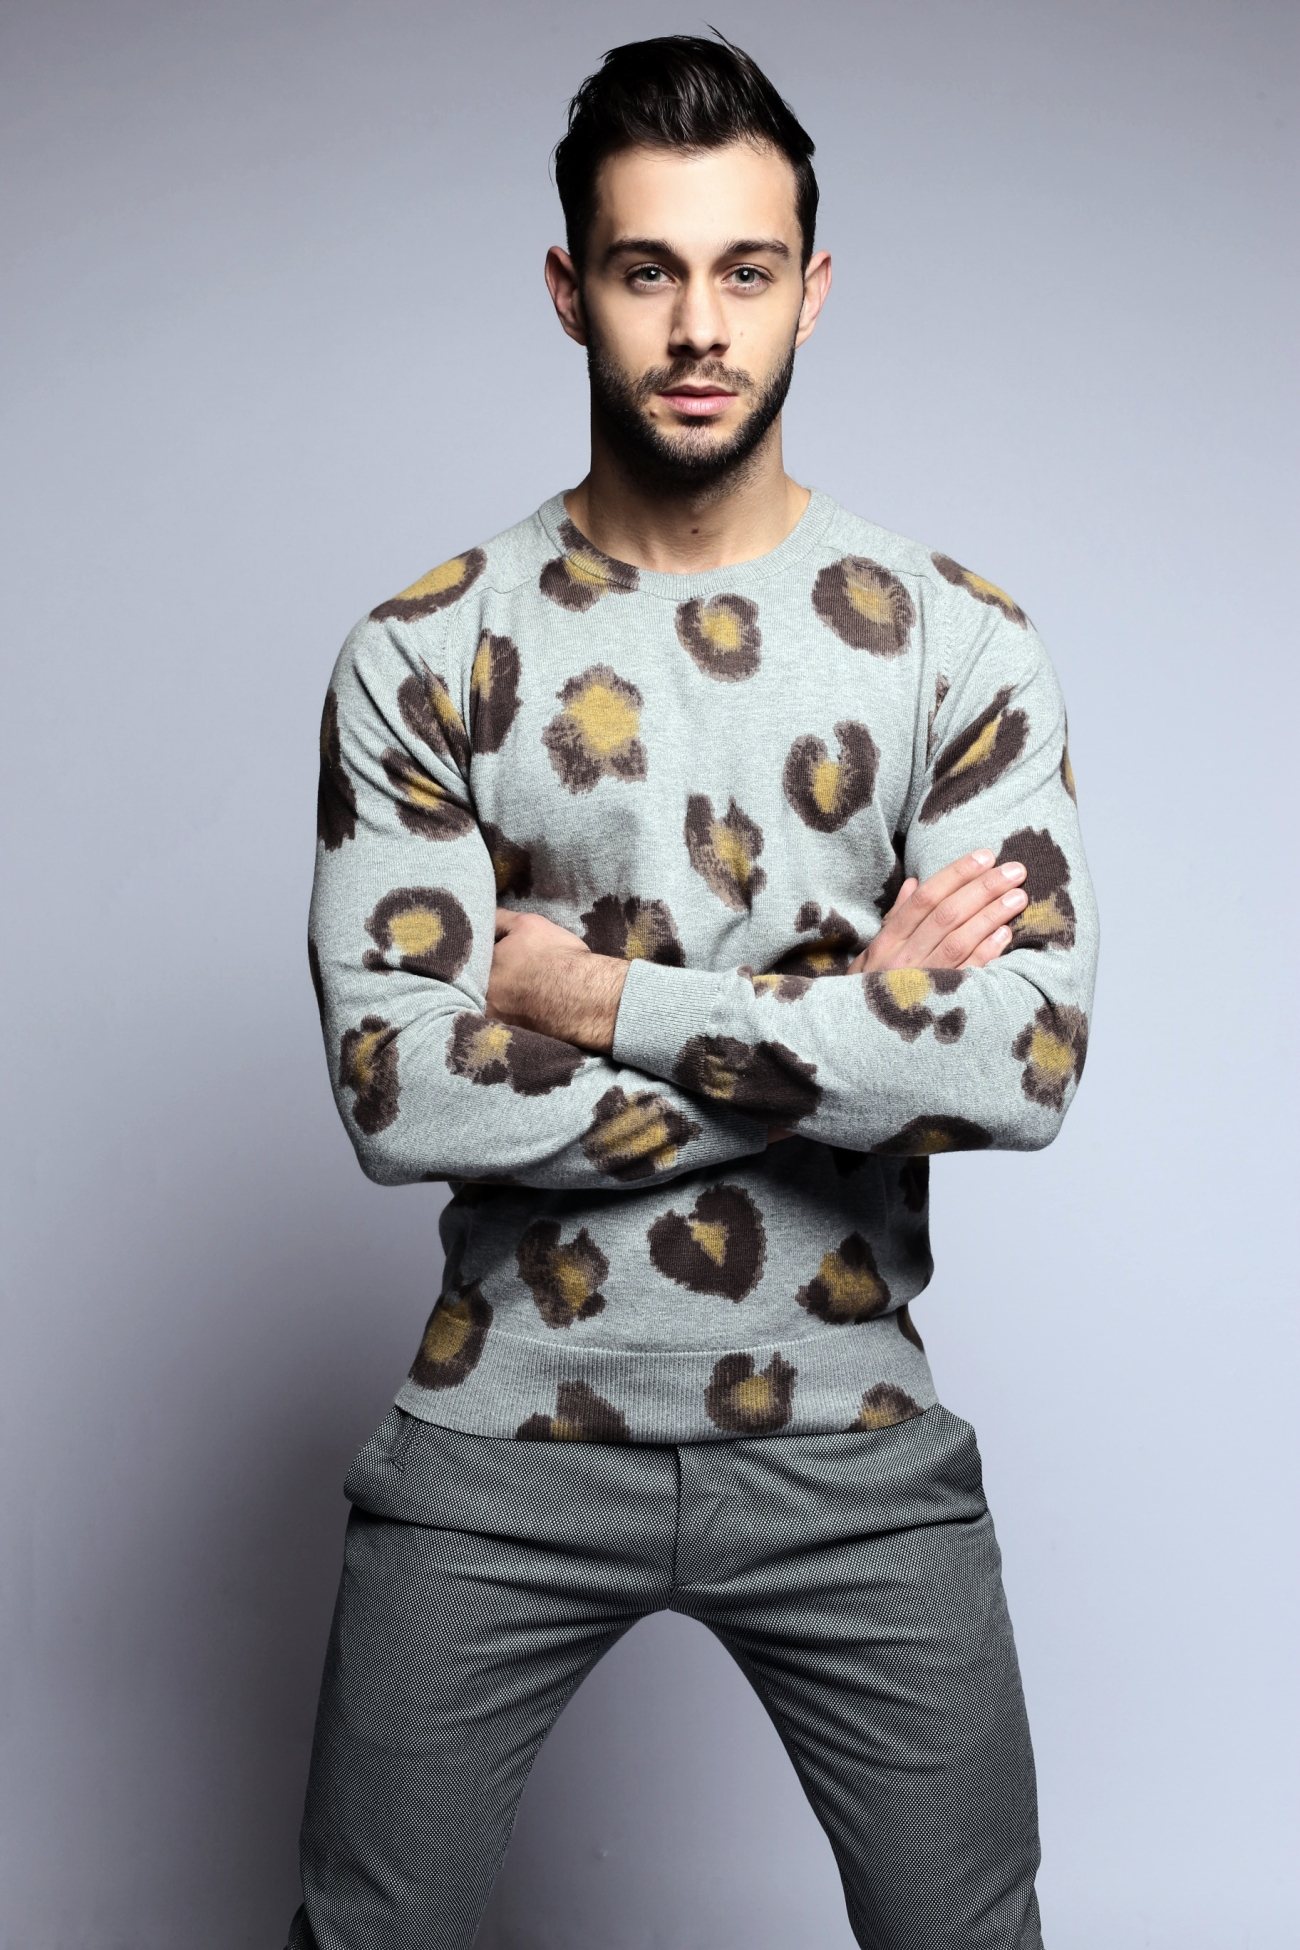 Adam Phillips by Arron Dunworth – Fashionably Male